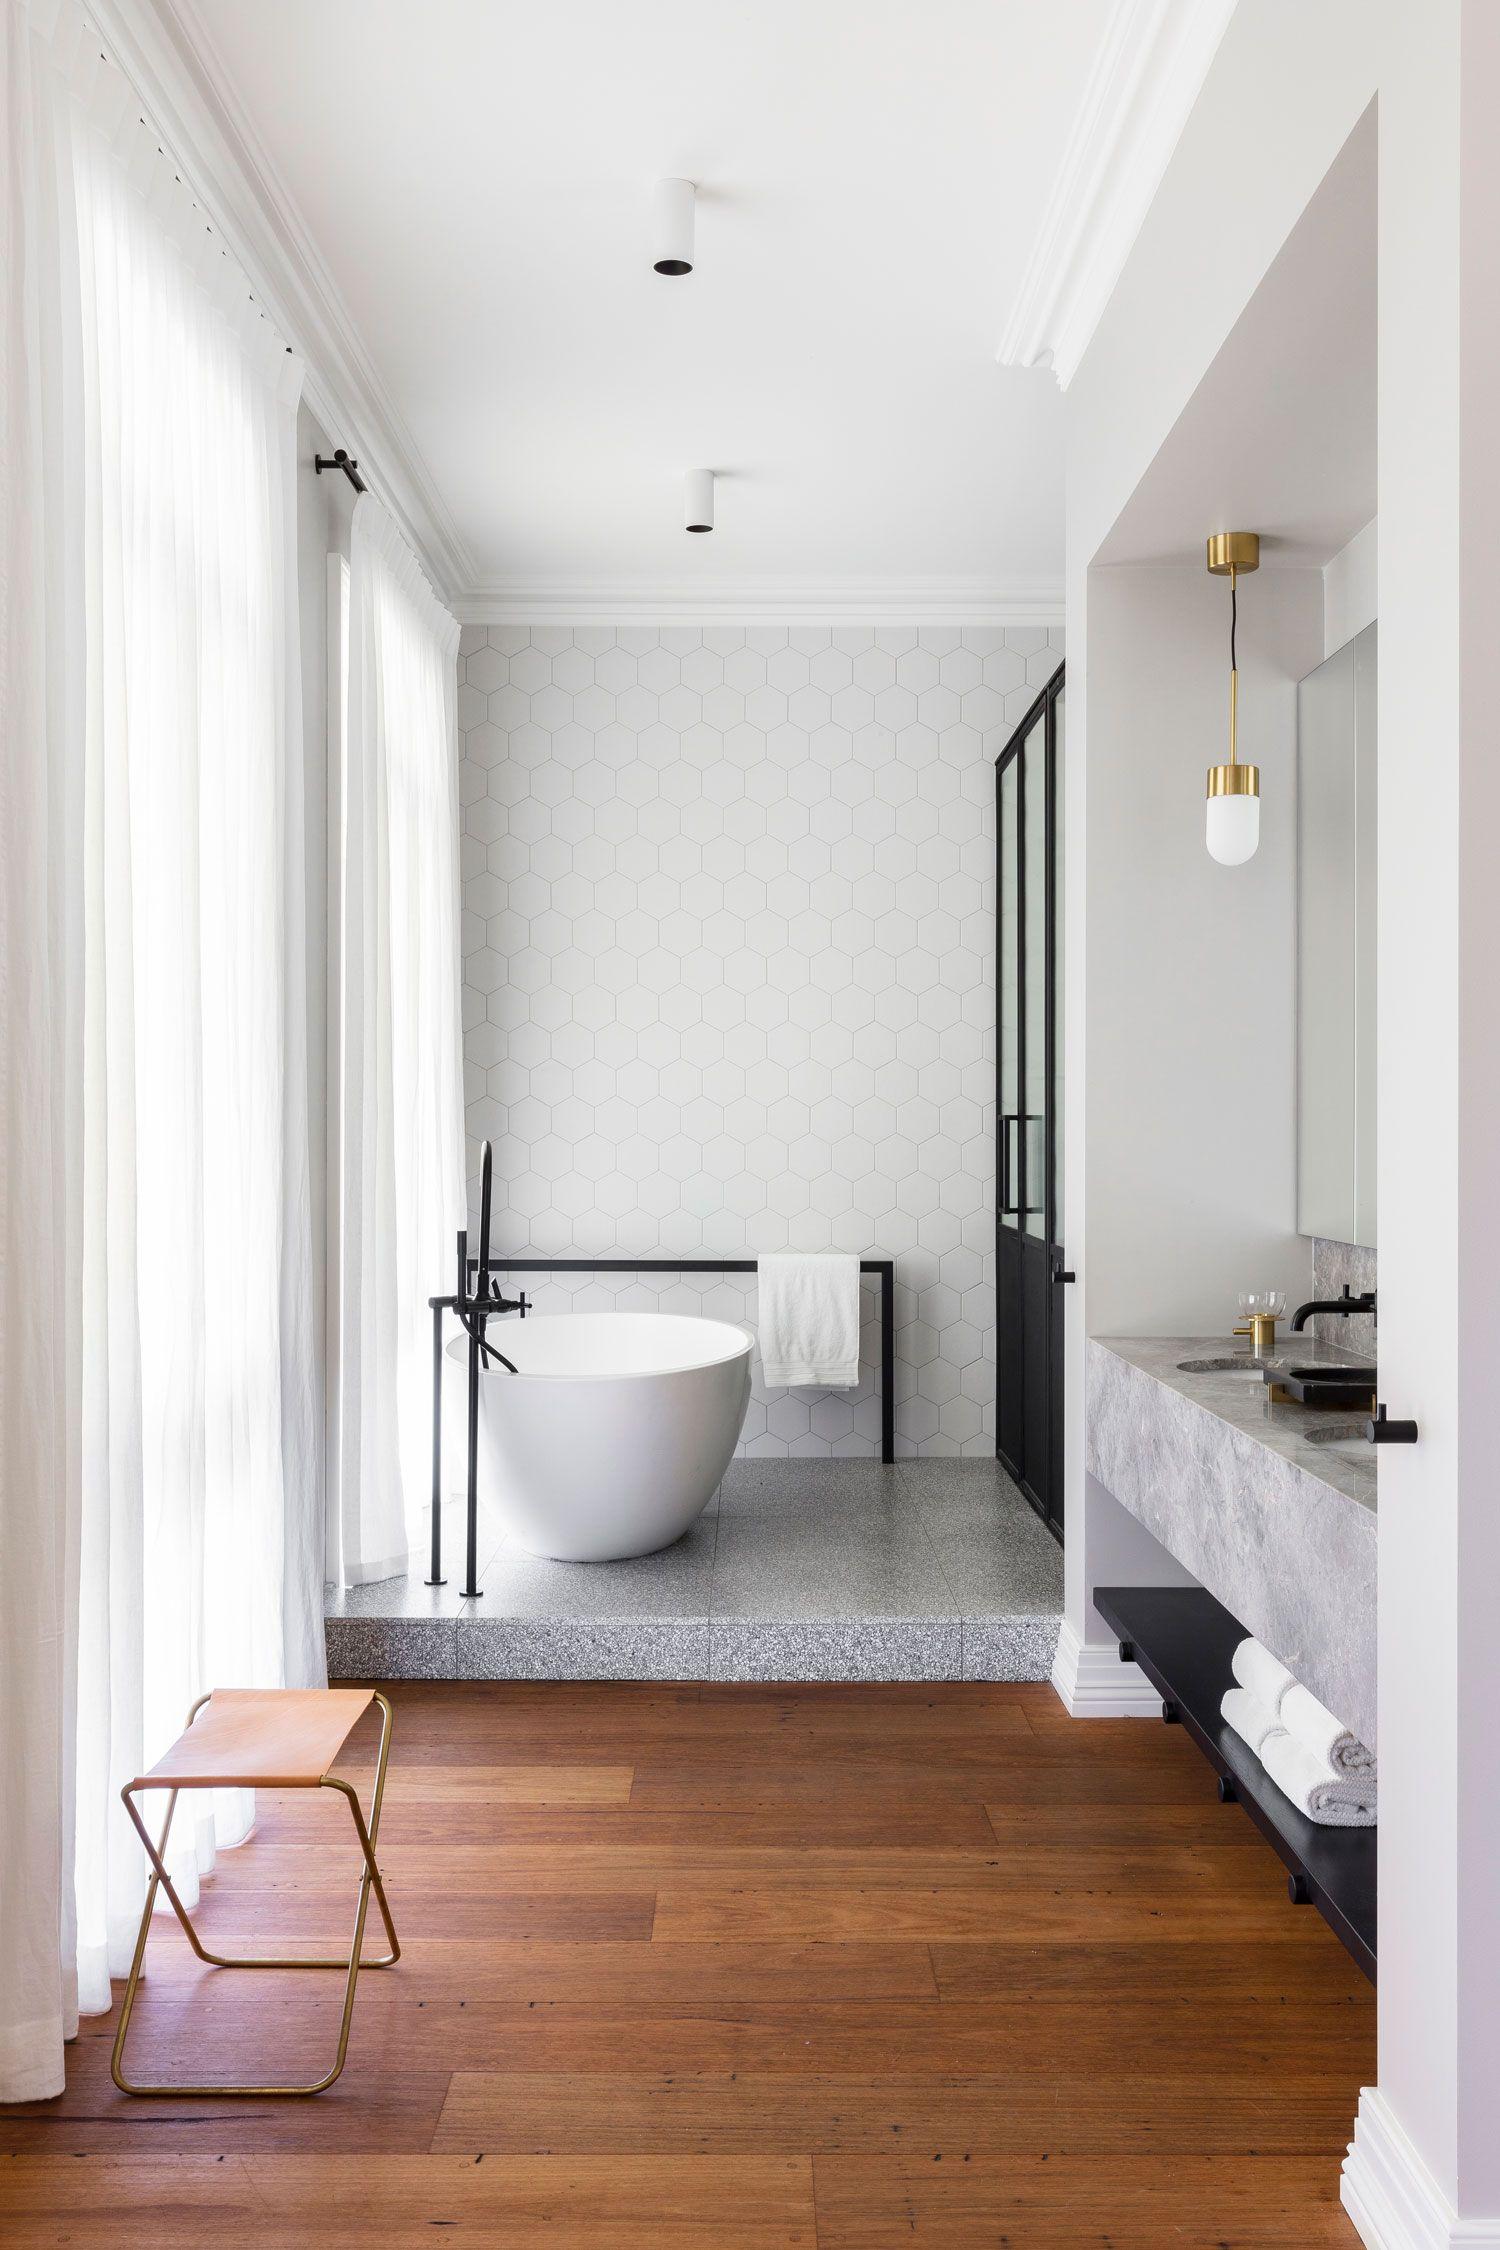 Barcom Terrace in Darlinghurst, Sydney by Arent&Pyke   Sydney, White ...